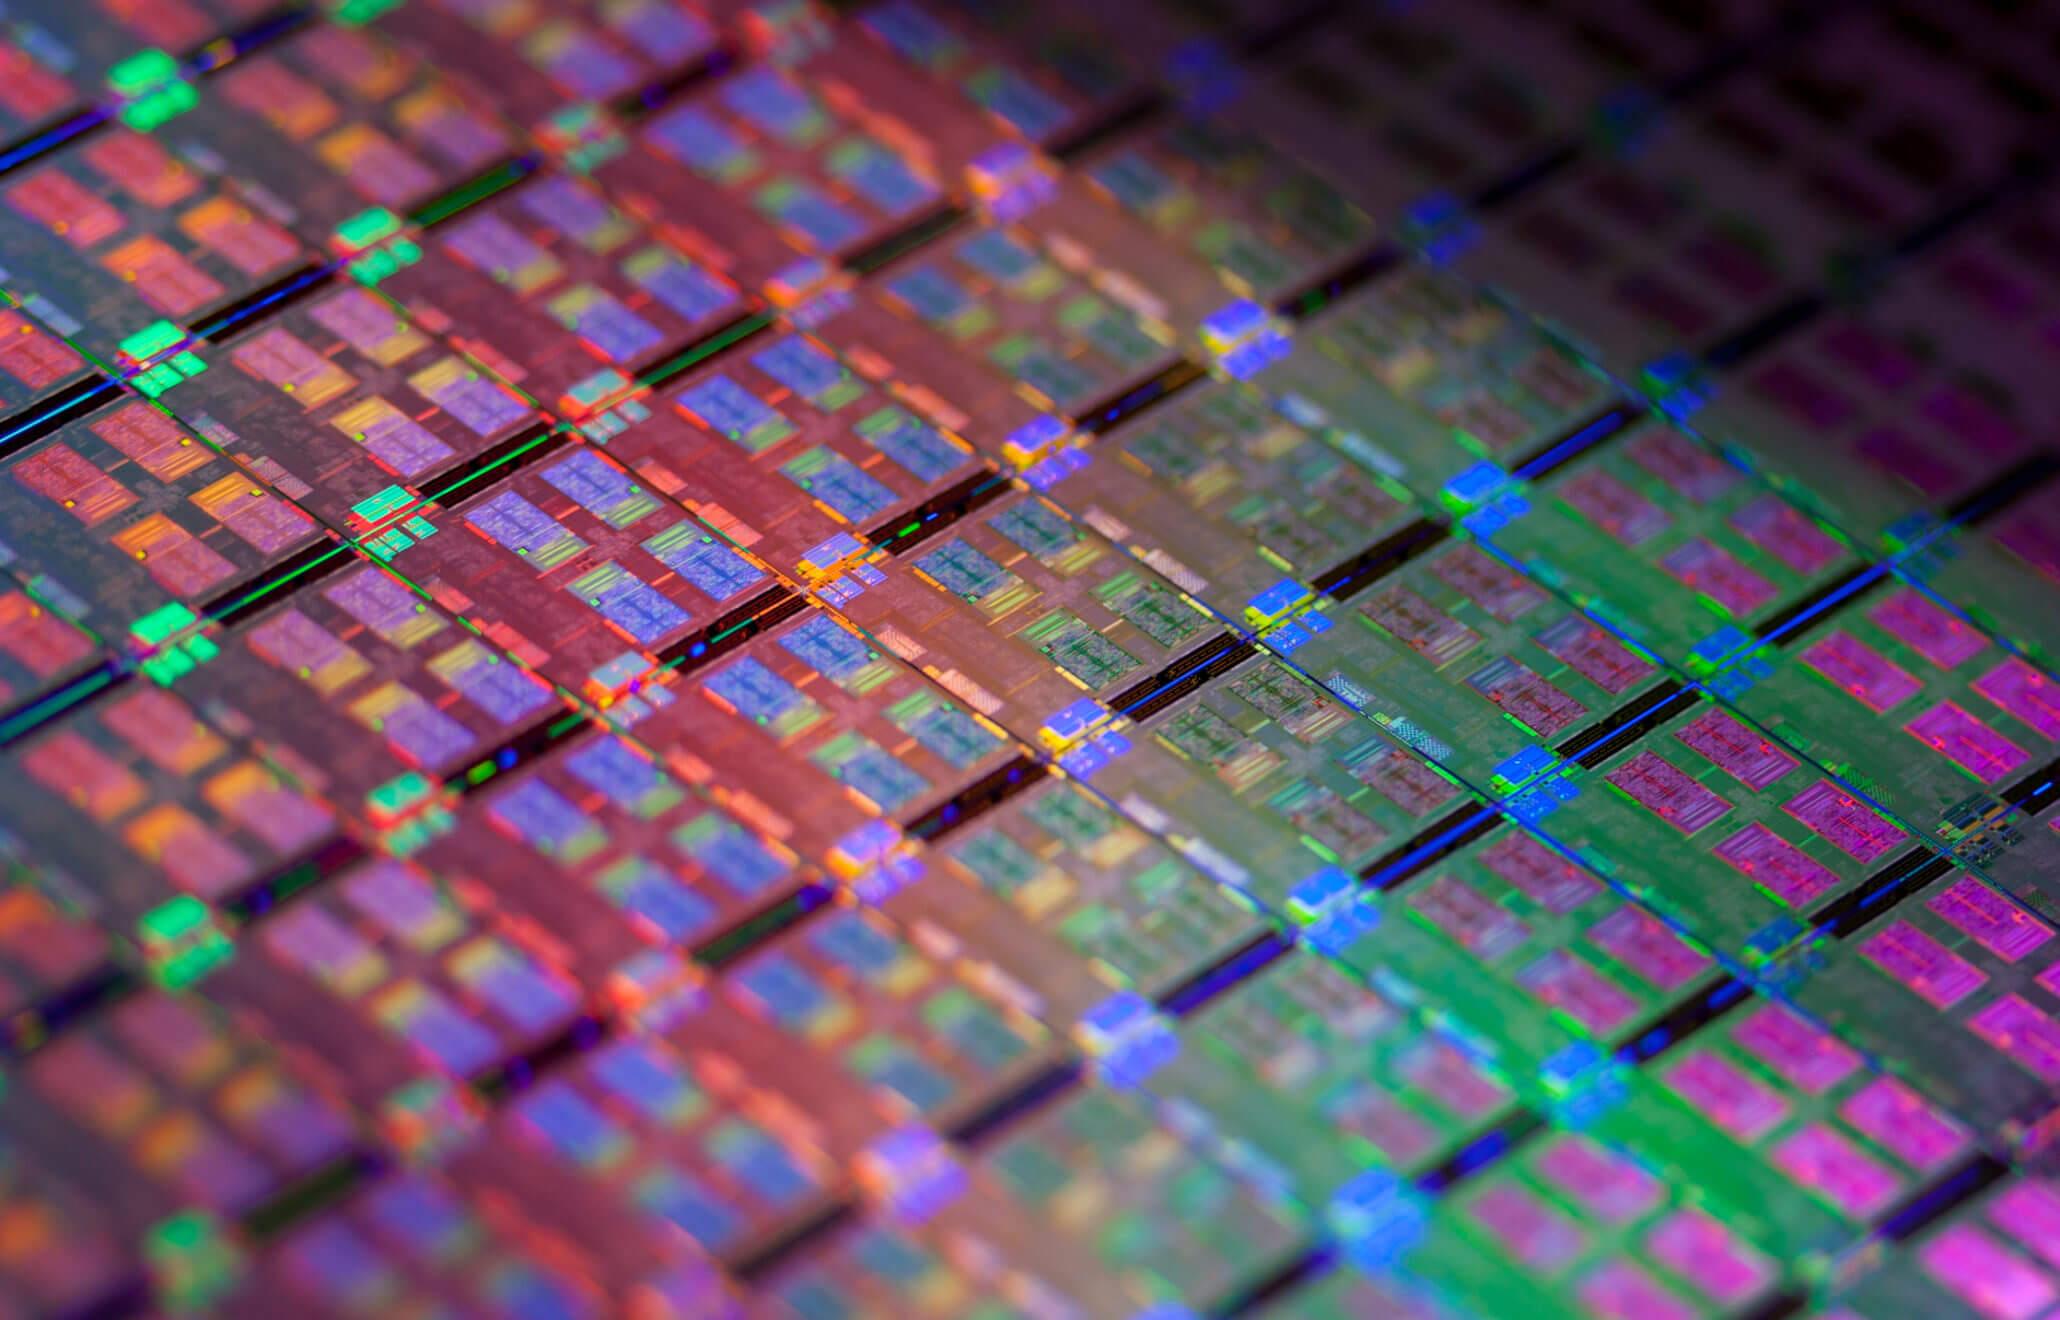 Intel Atom C2700 Series